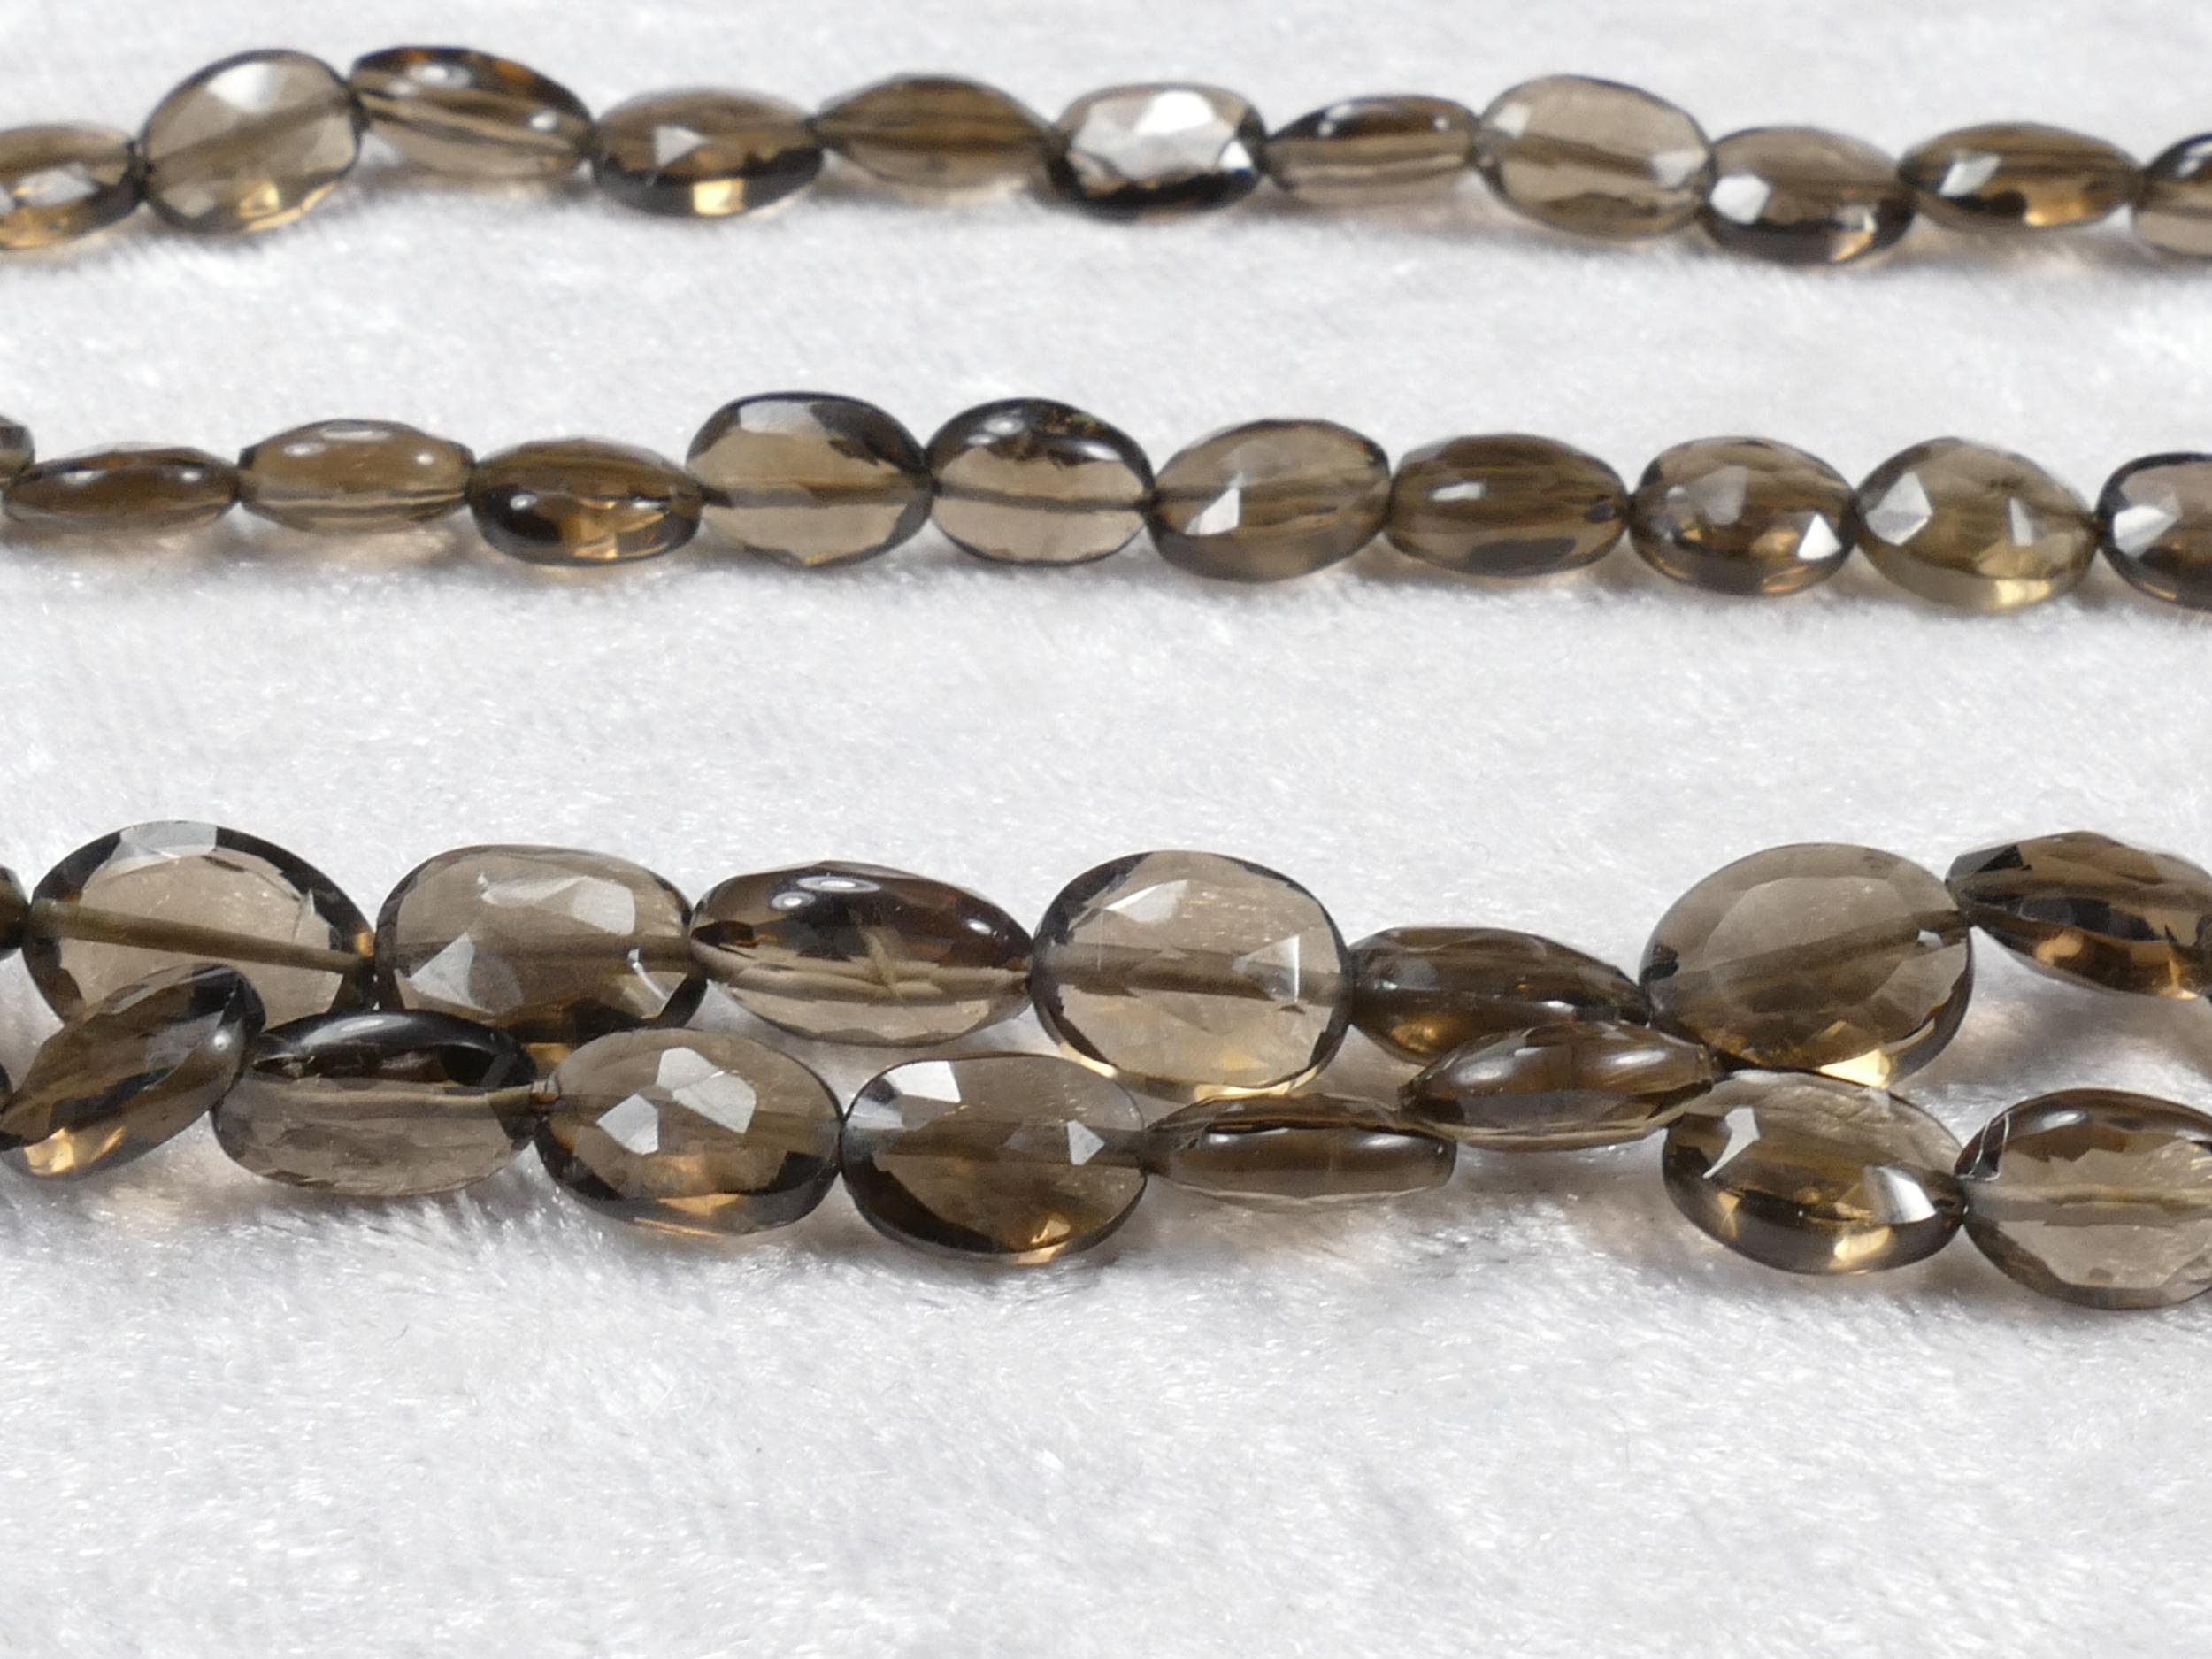 7x5/9x7mm AA/AAA+ x10 Perles de Quartz fumé naturel ovale facettée (#AC984)